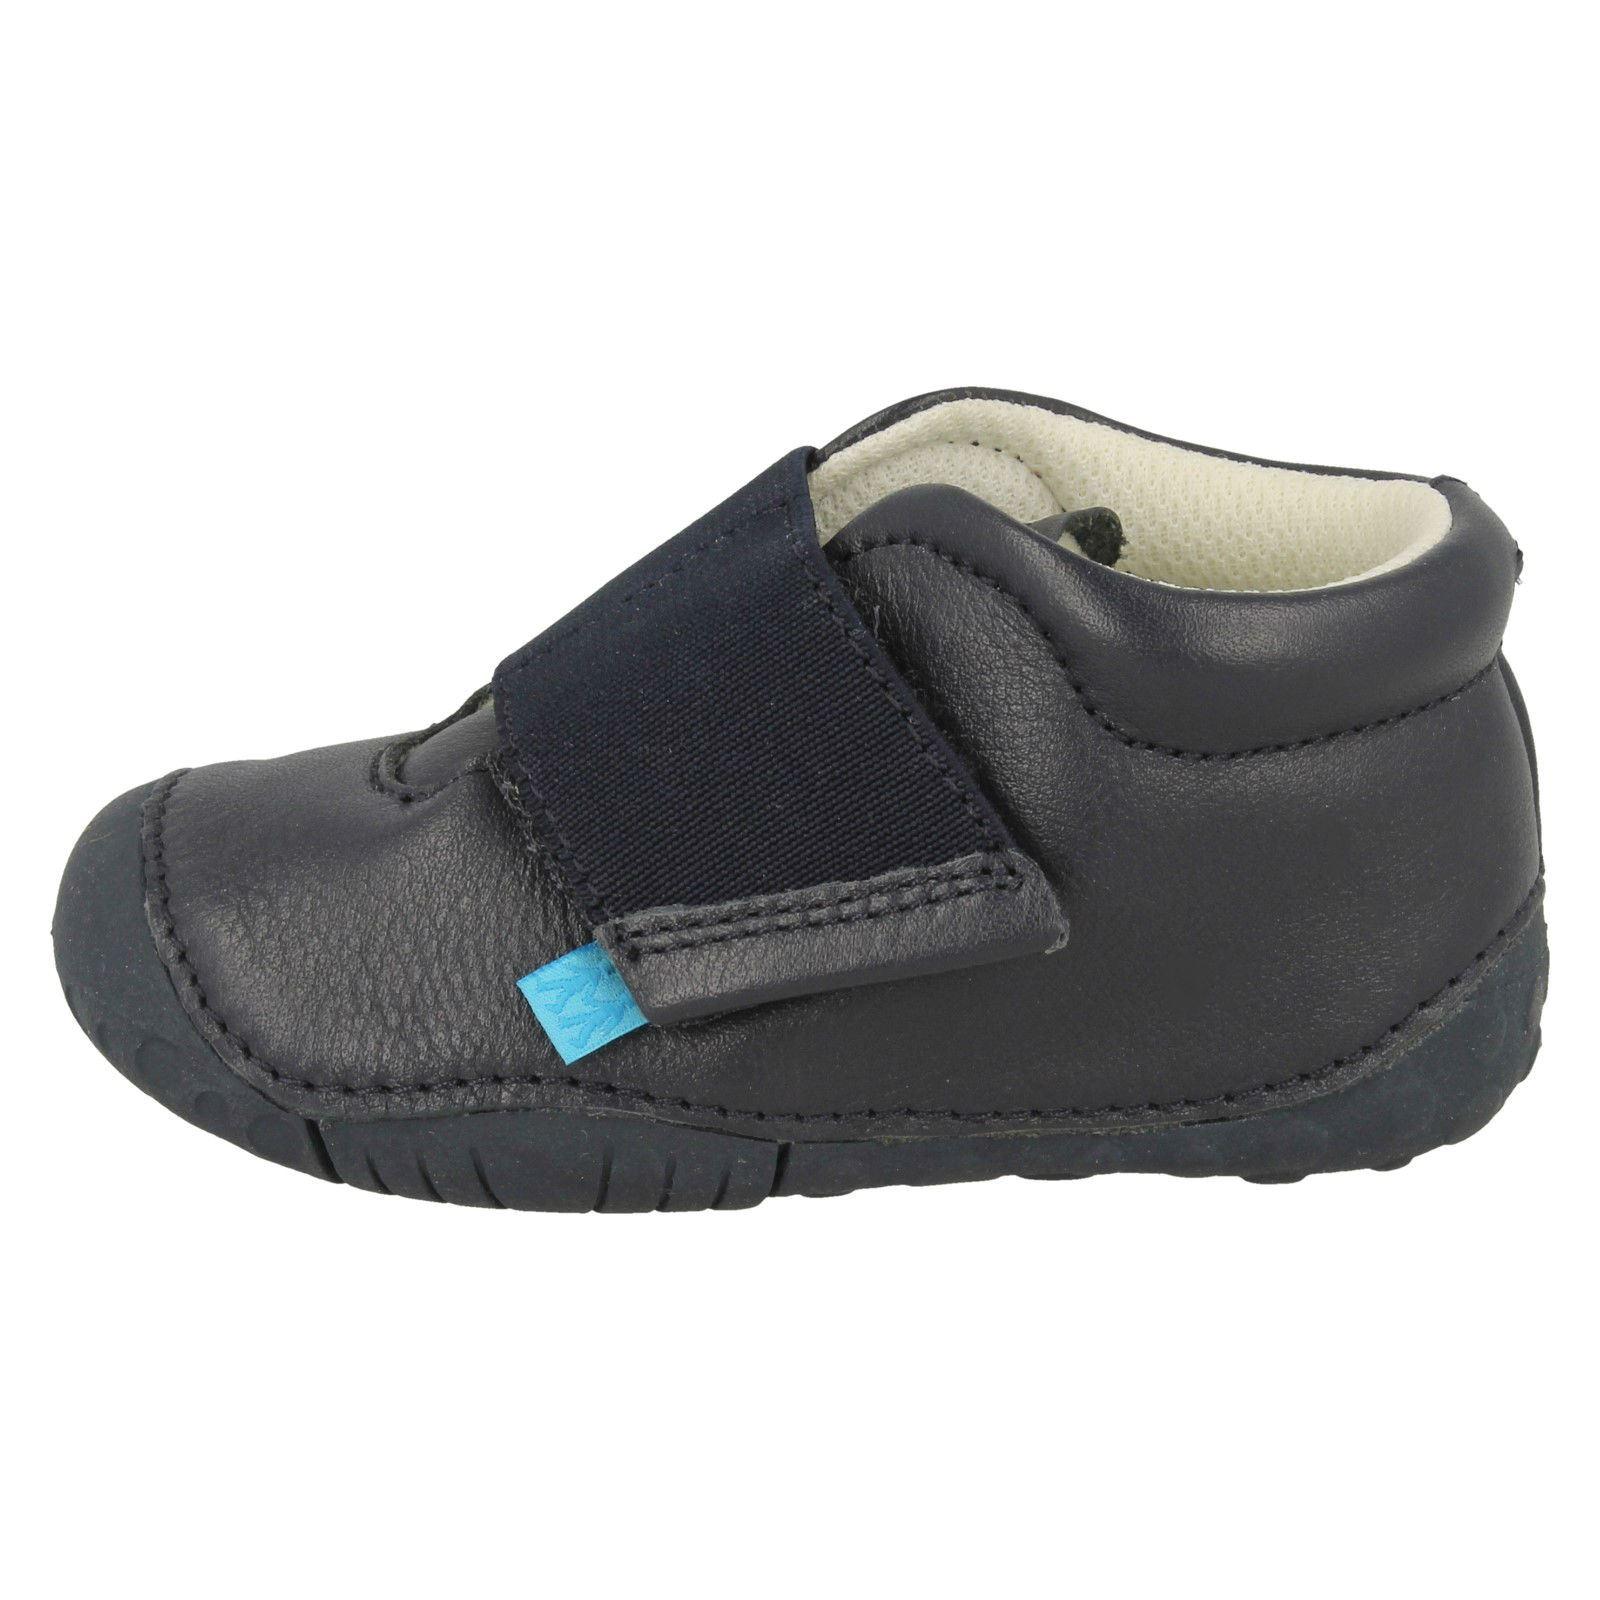 azul Casual Startrite walkers Pre Boys Calzado nFRXw55d